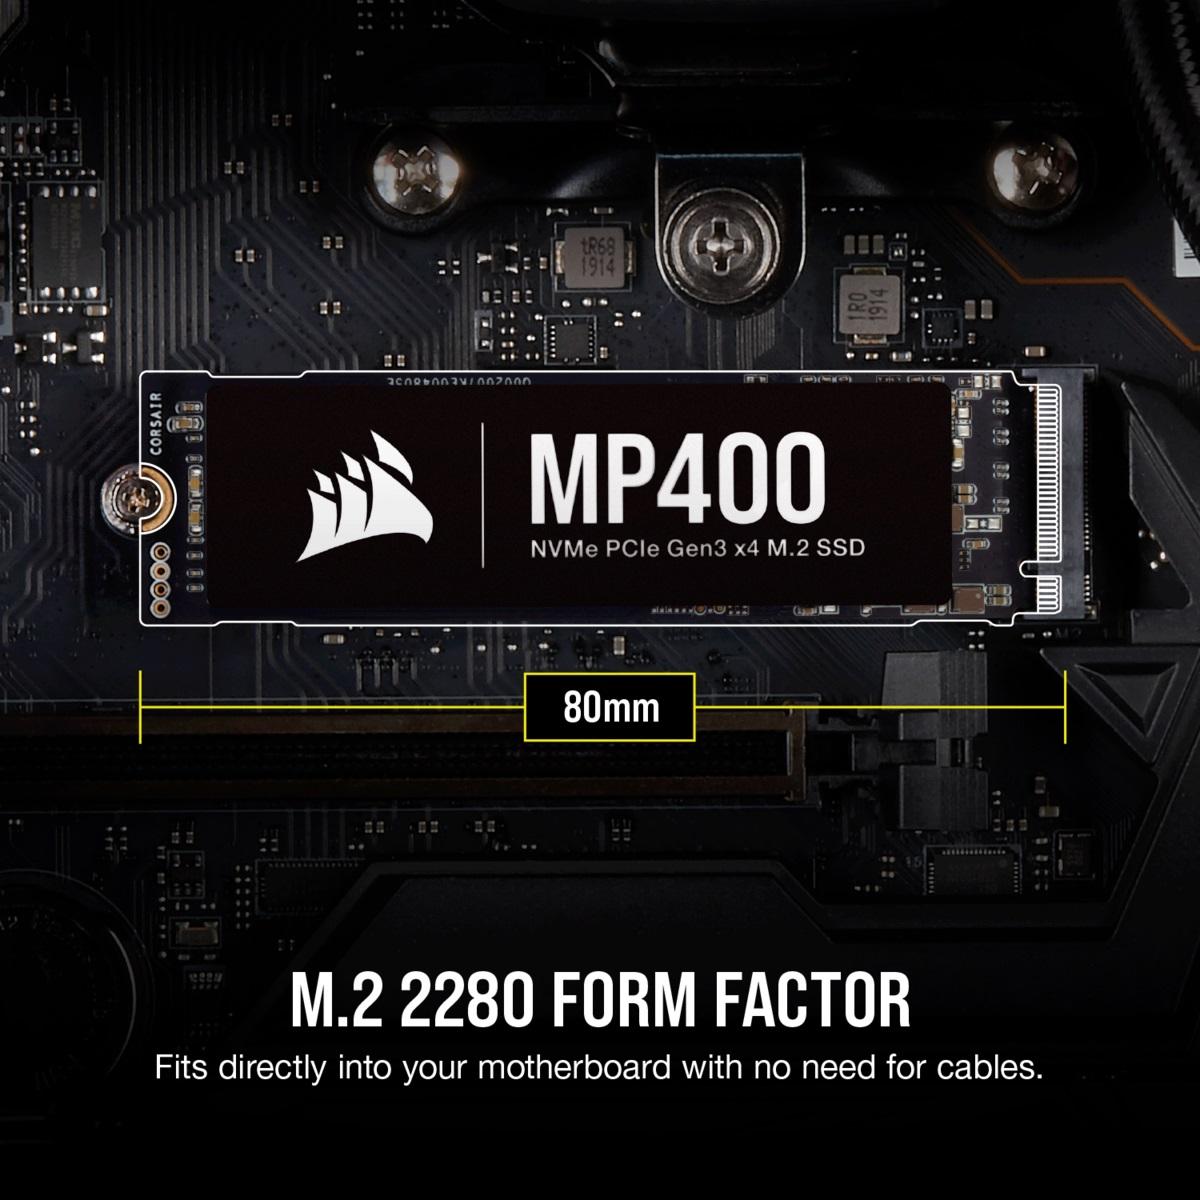 base-mp400-config-gallery-mp400-05